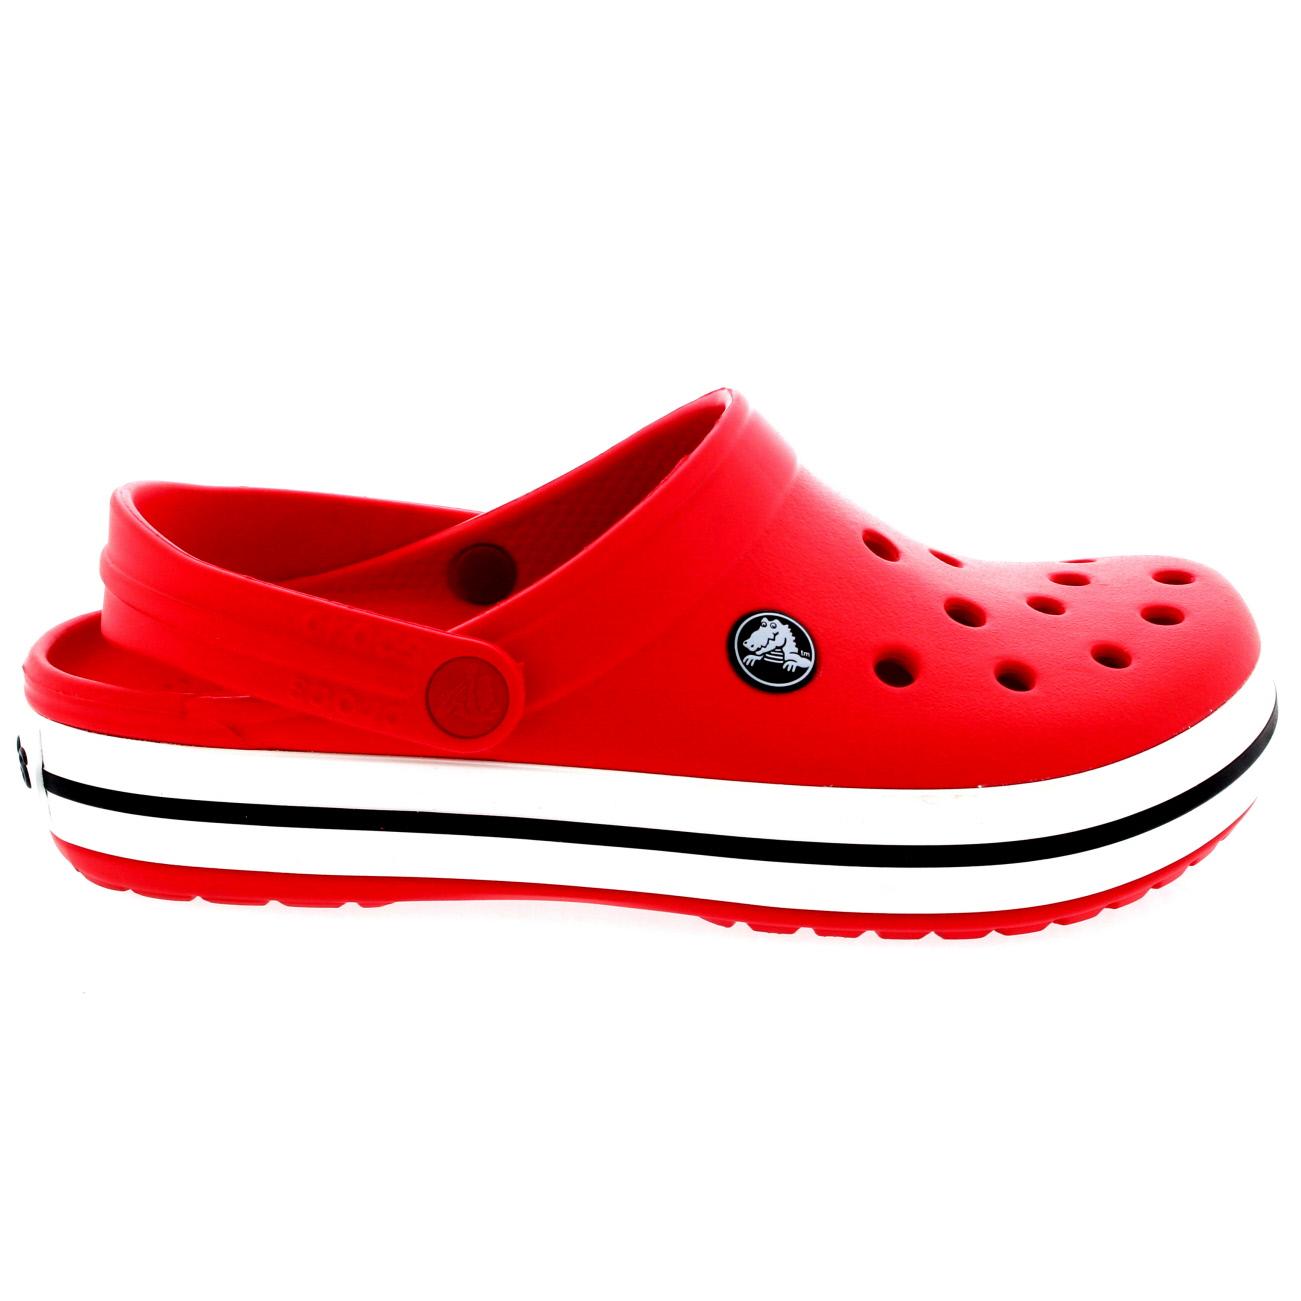 Crocs Womens Work Shoes Size